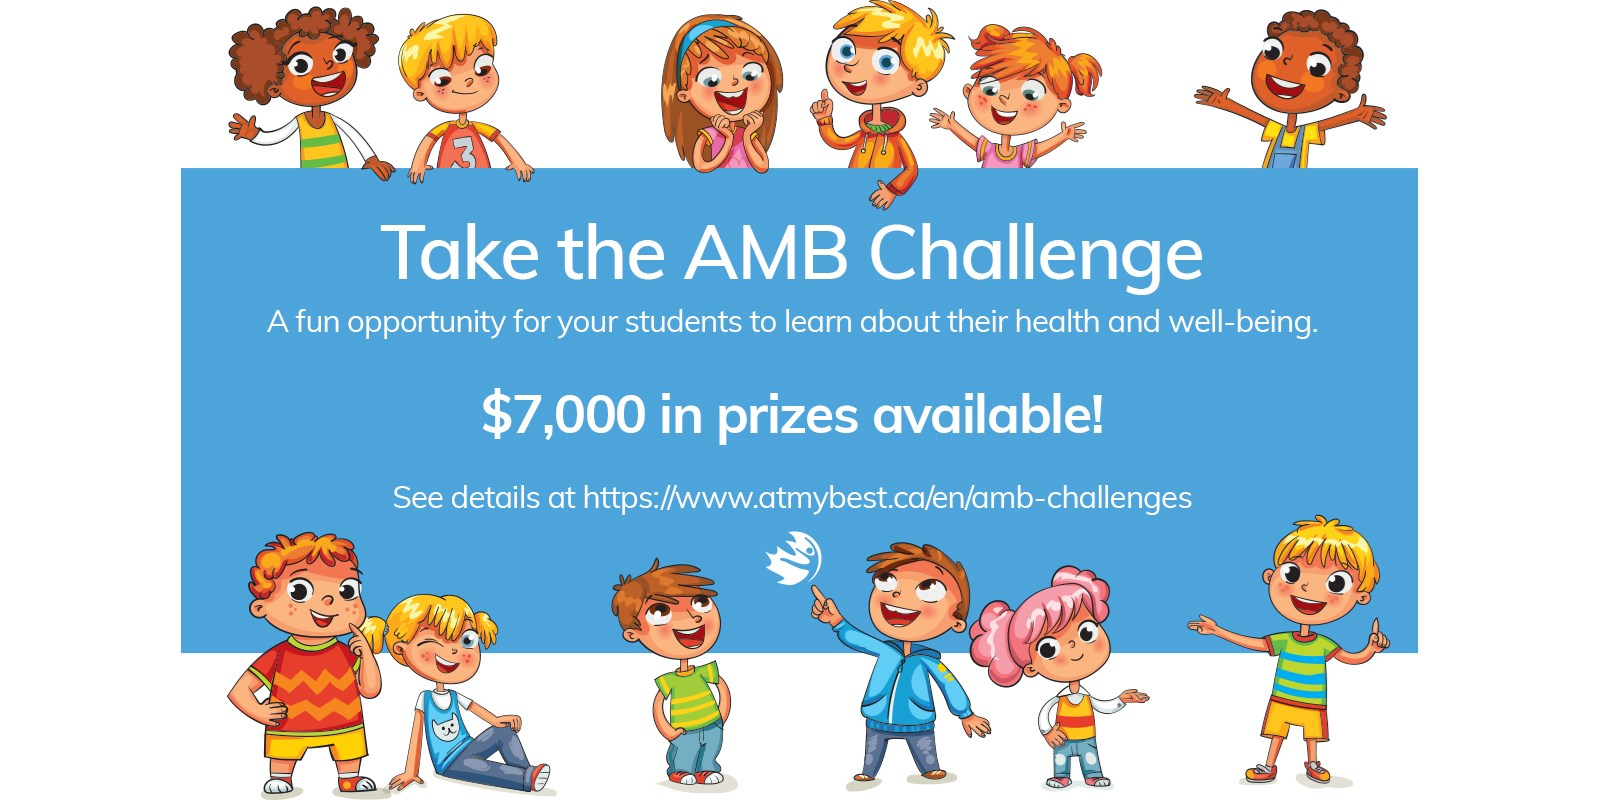 AMB challenge graphic 2019.jpg